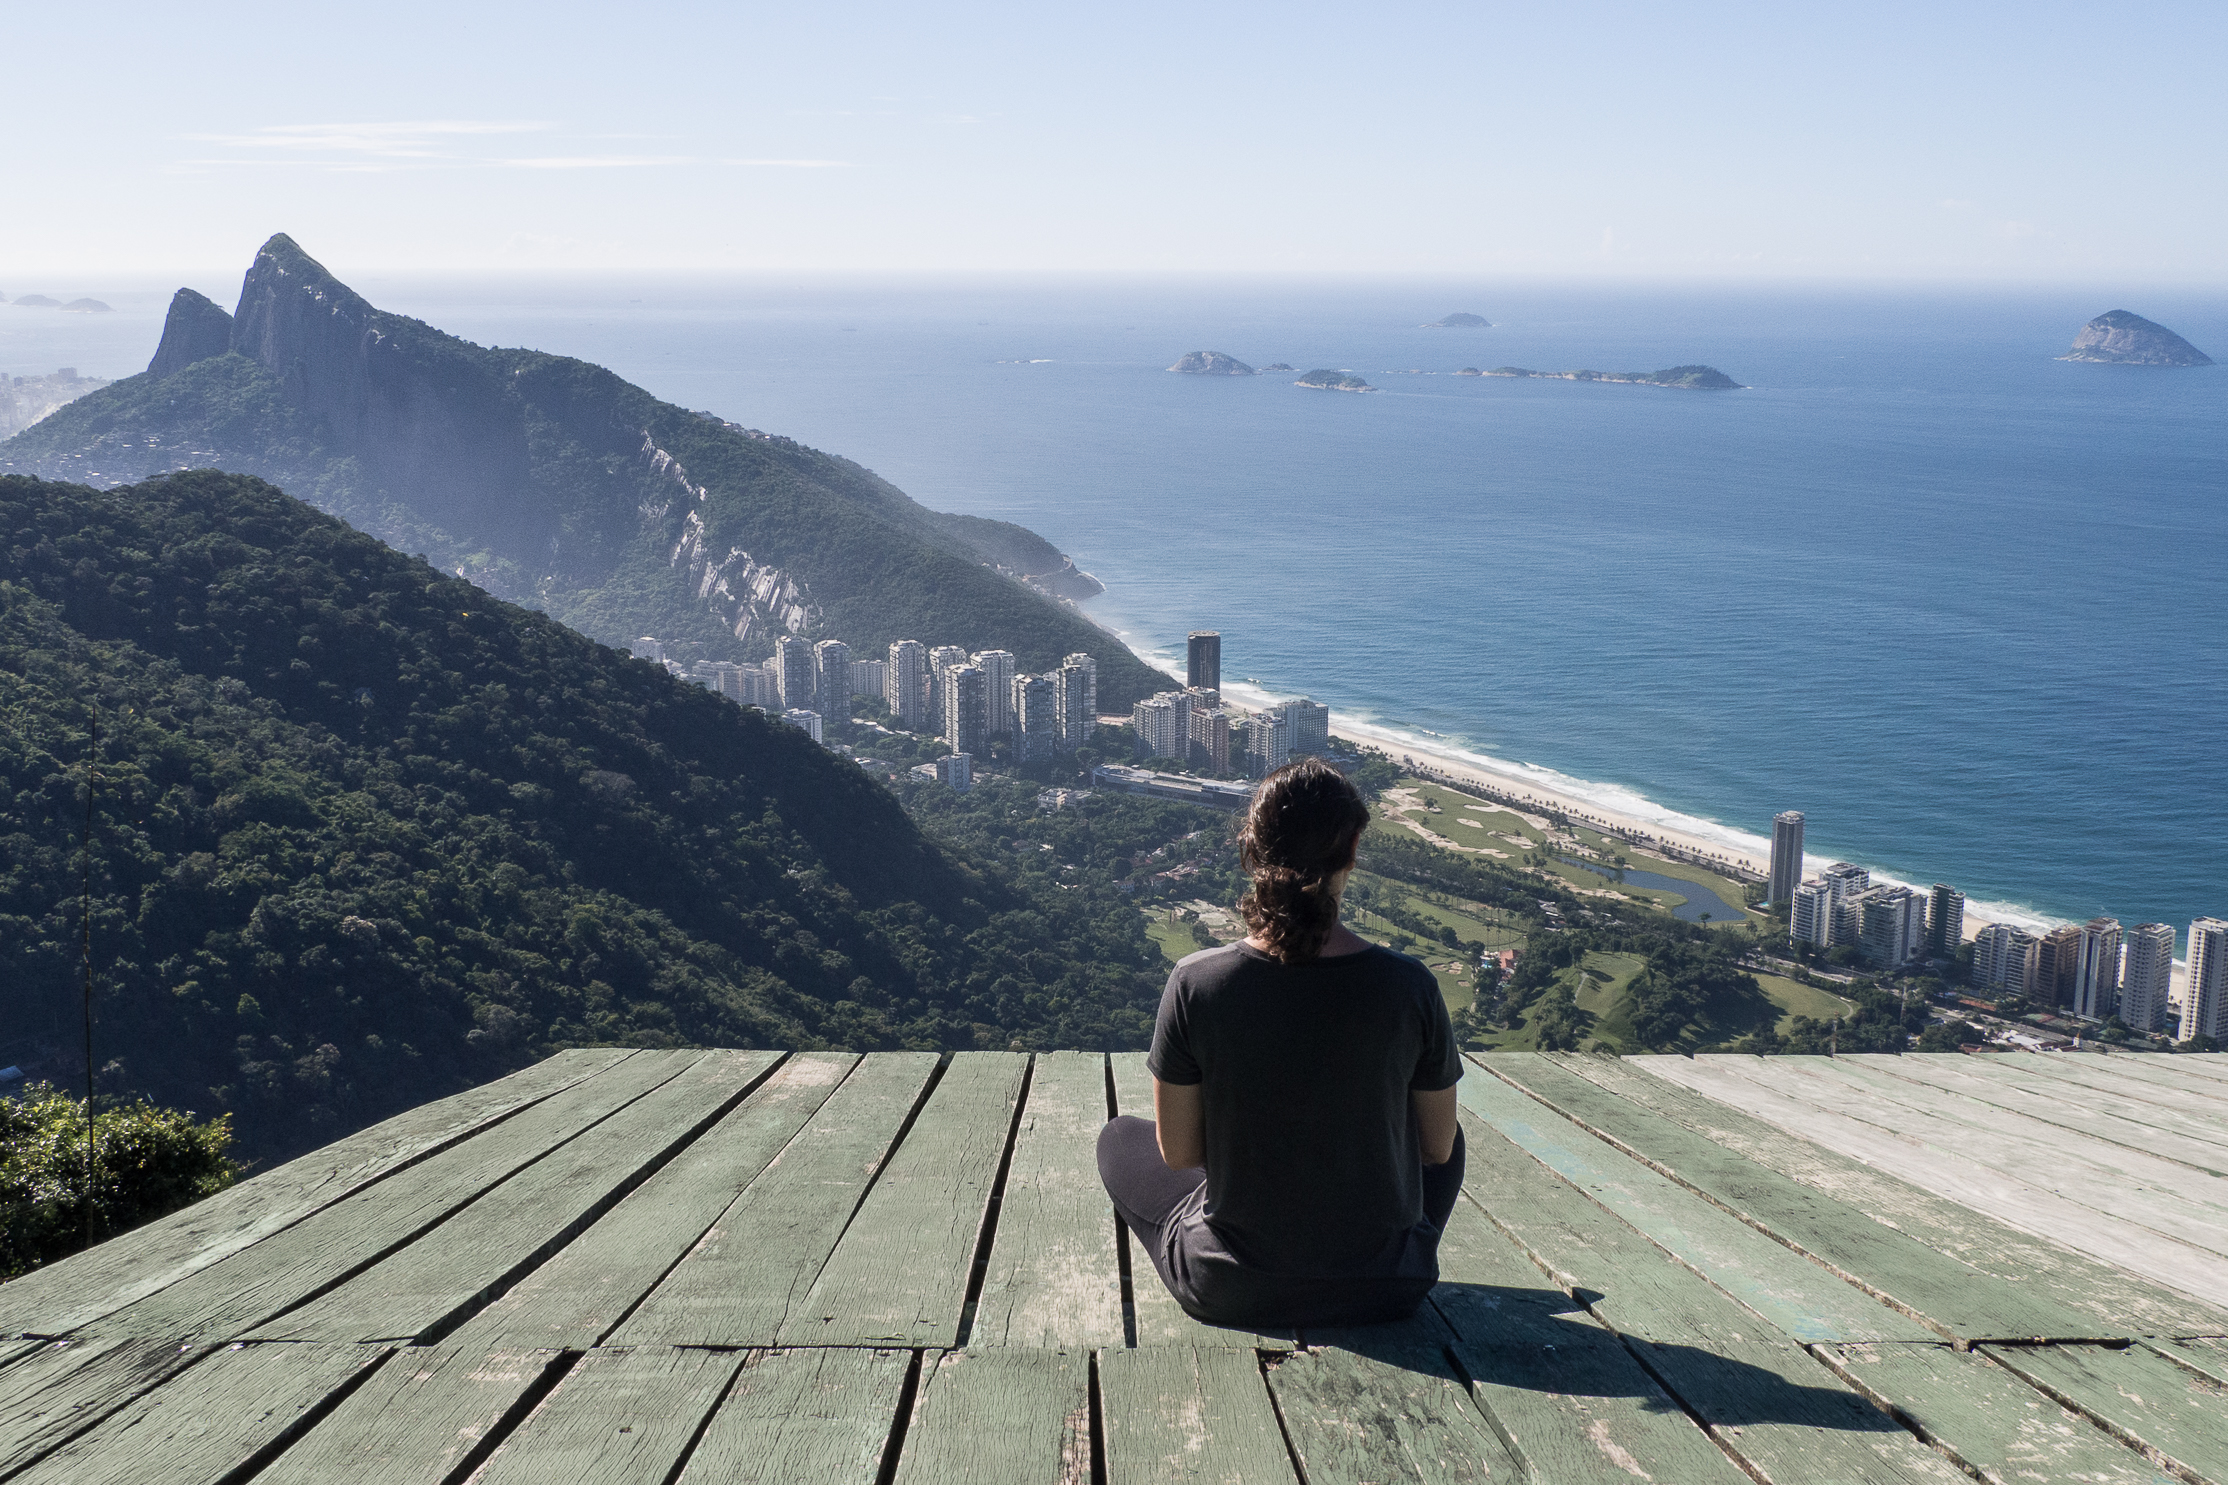 Admirer la vue depuis la rampe de décollage de Padra Bonita, Rio de Janeiro.